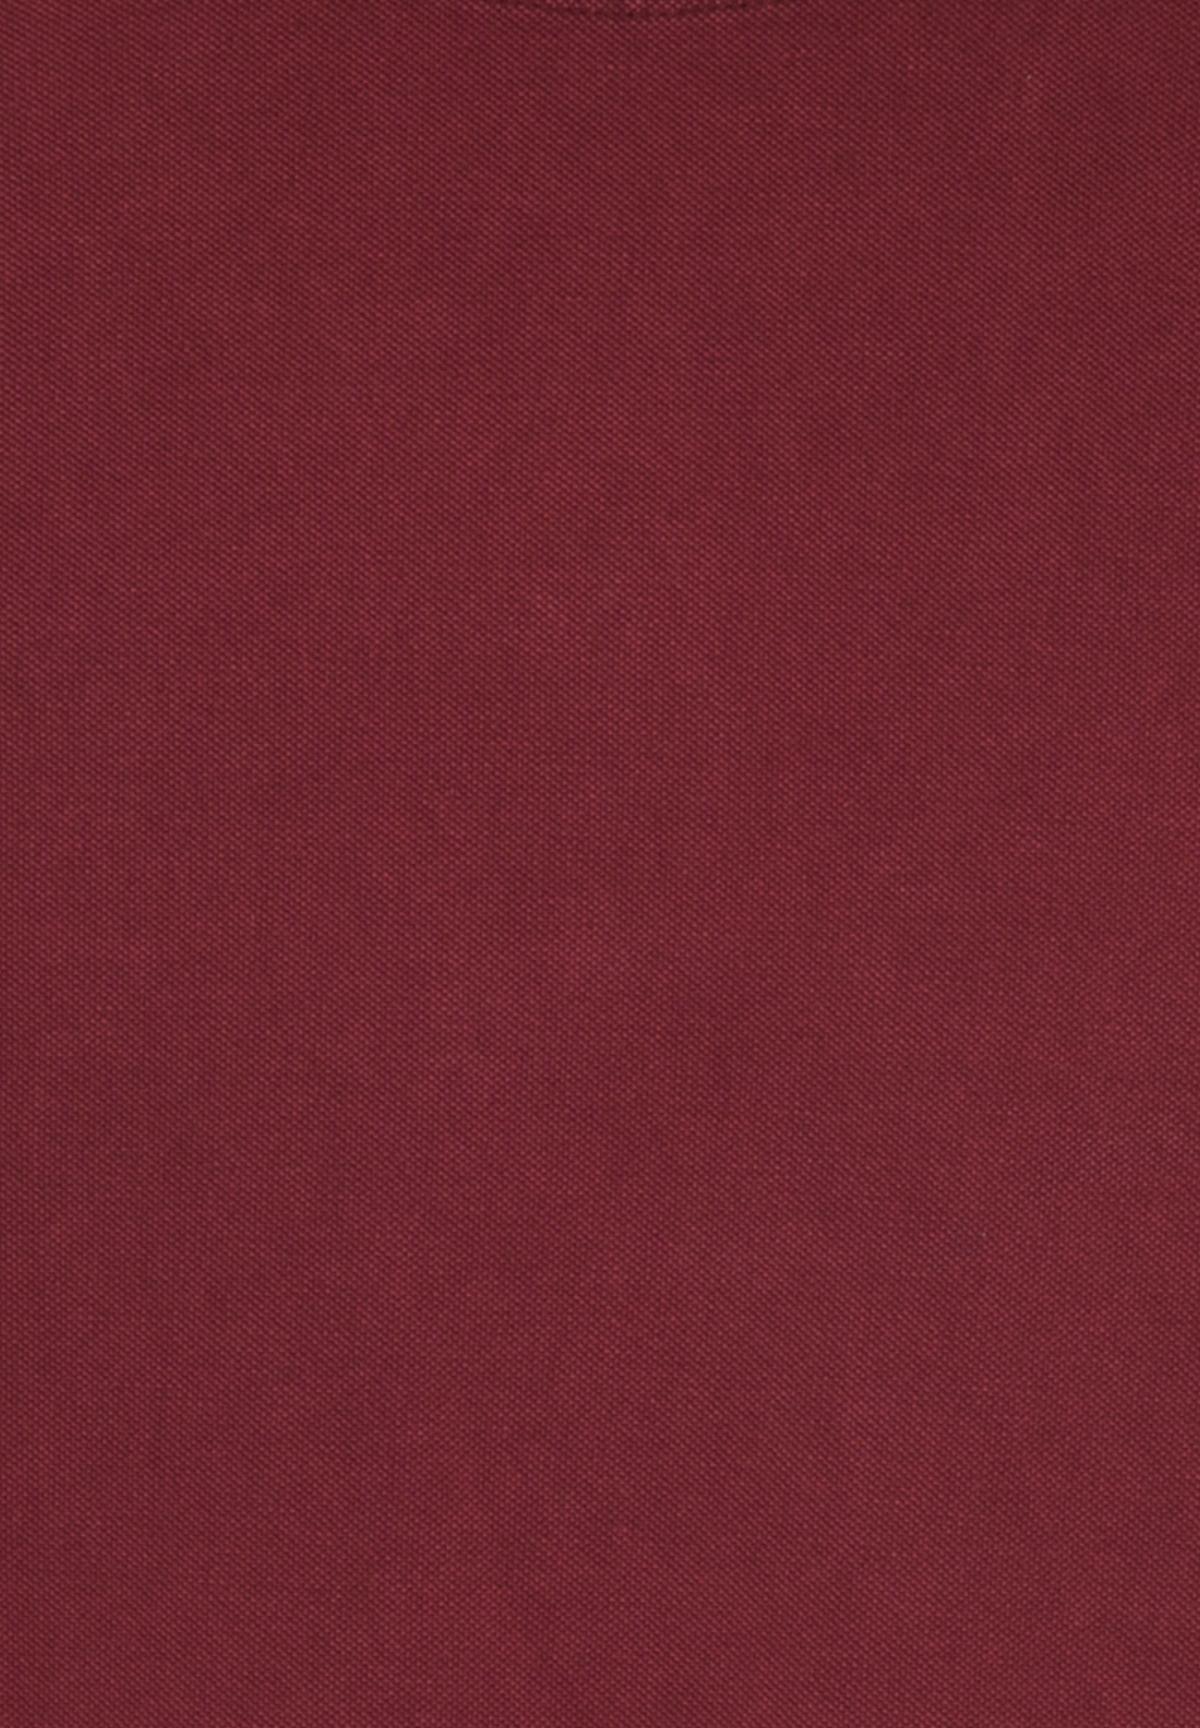 Camel-Active-Herren-Shirt-Poloshirt-Pique-Regular-Fit-NEU Indexbild 56